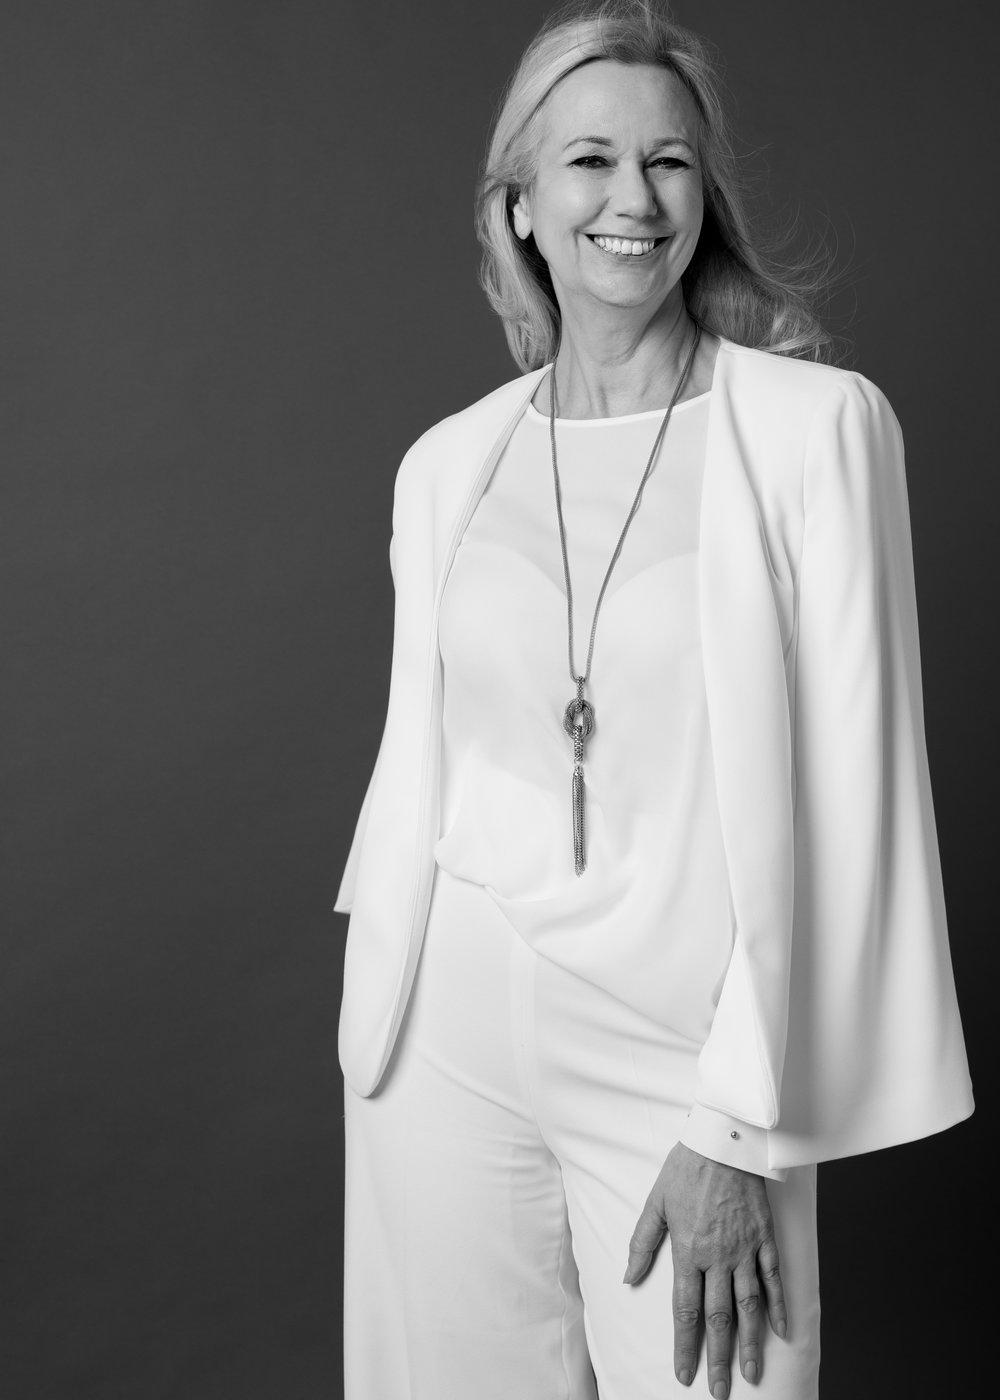 Joanna Millinery Designer